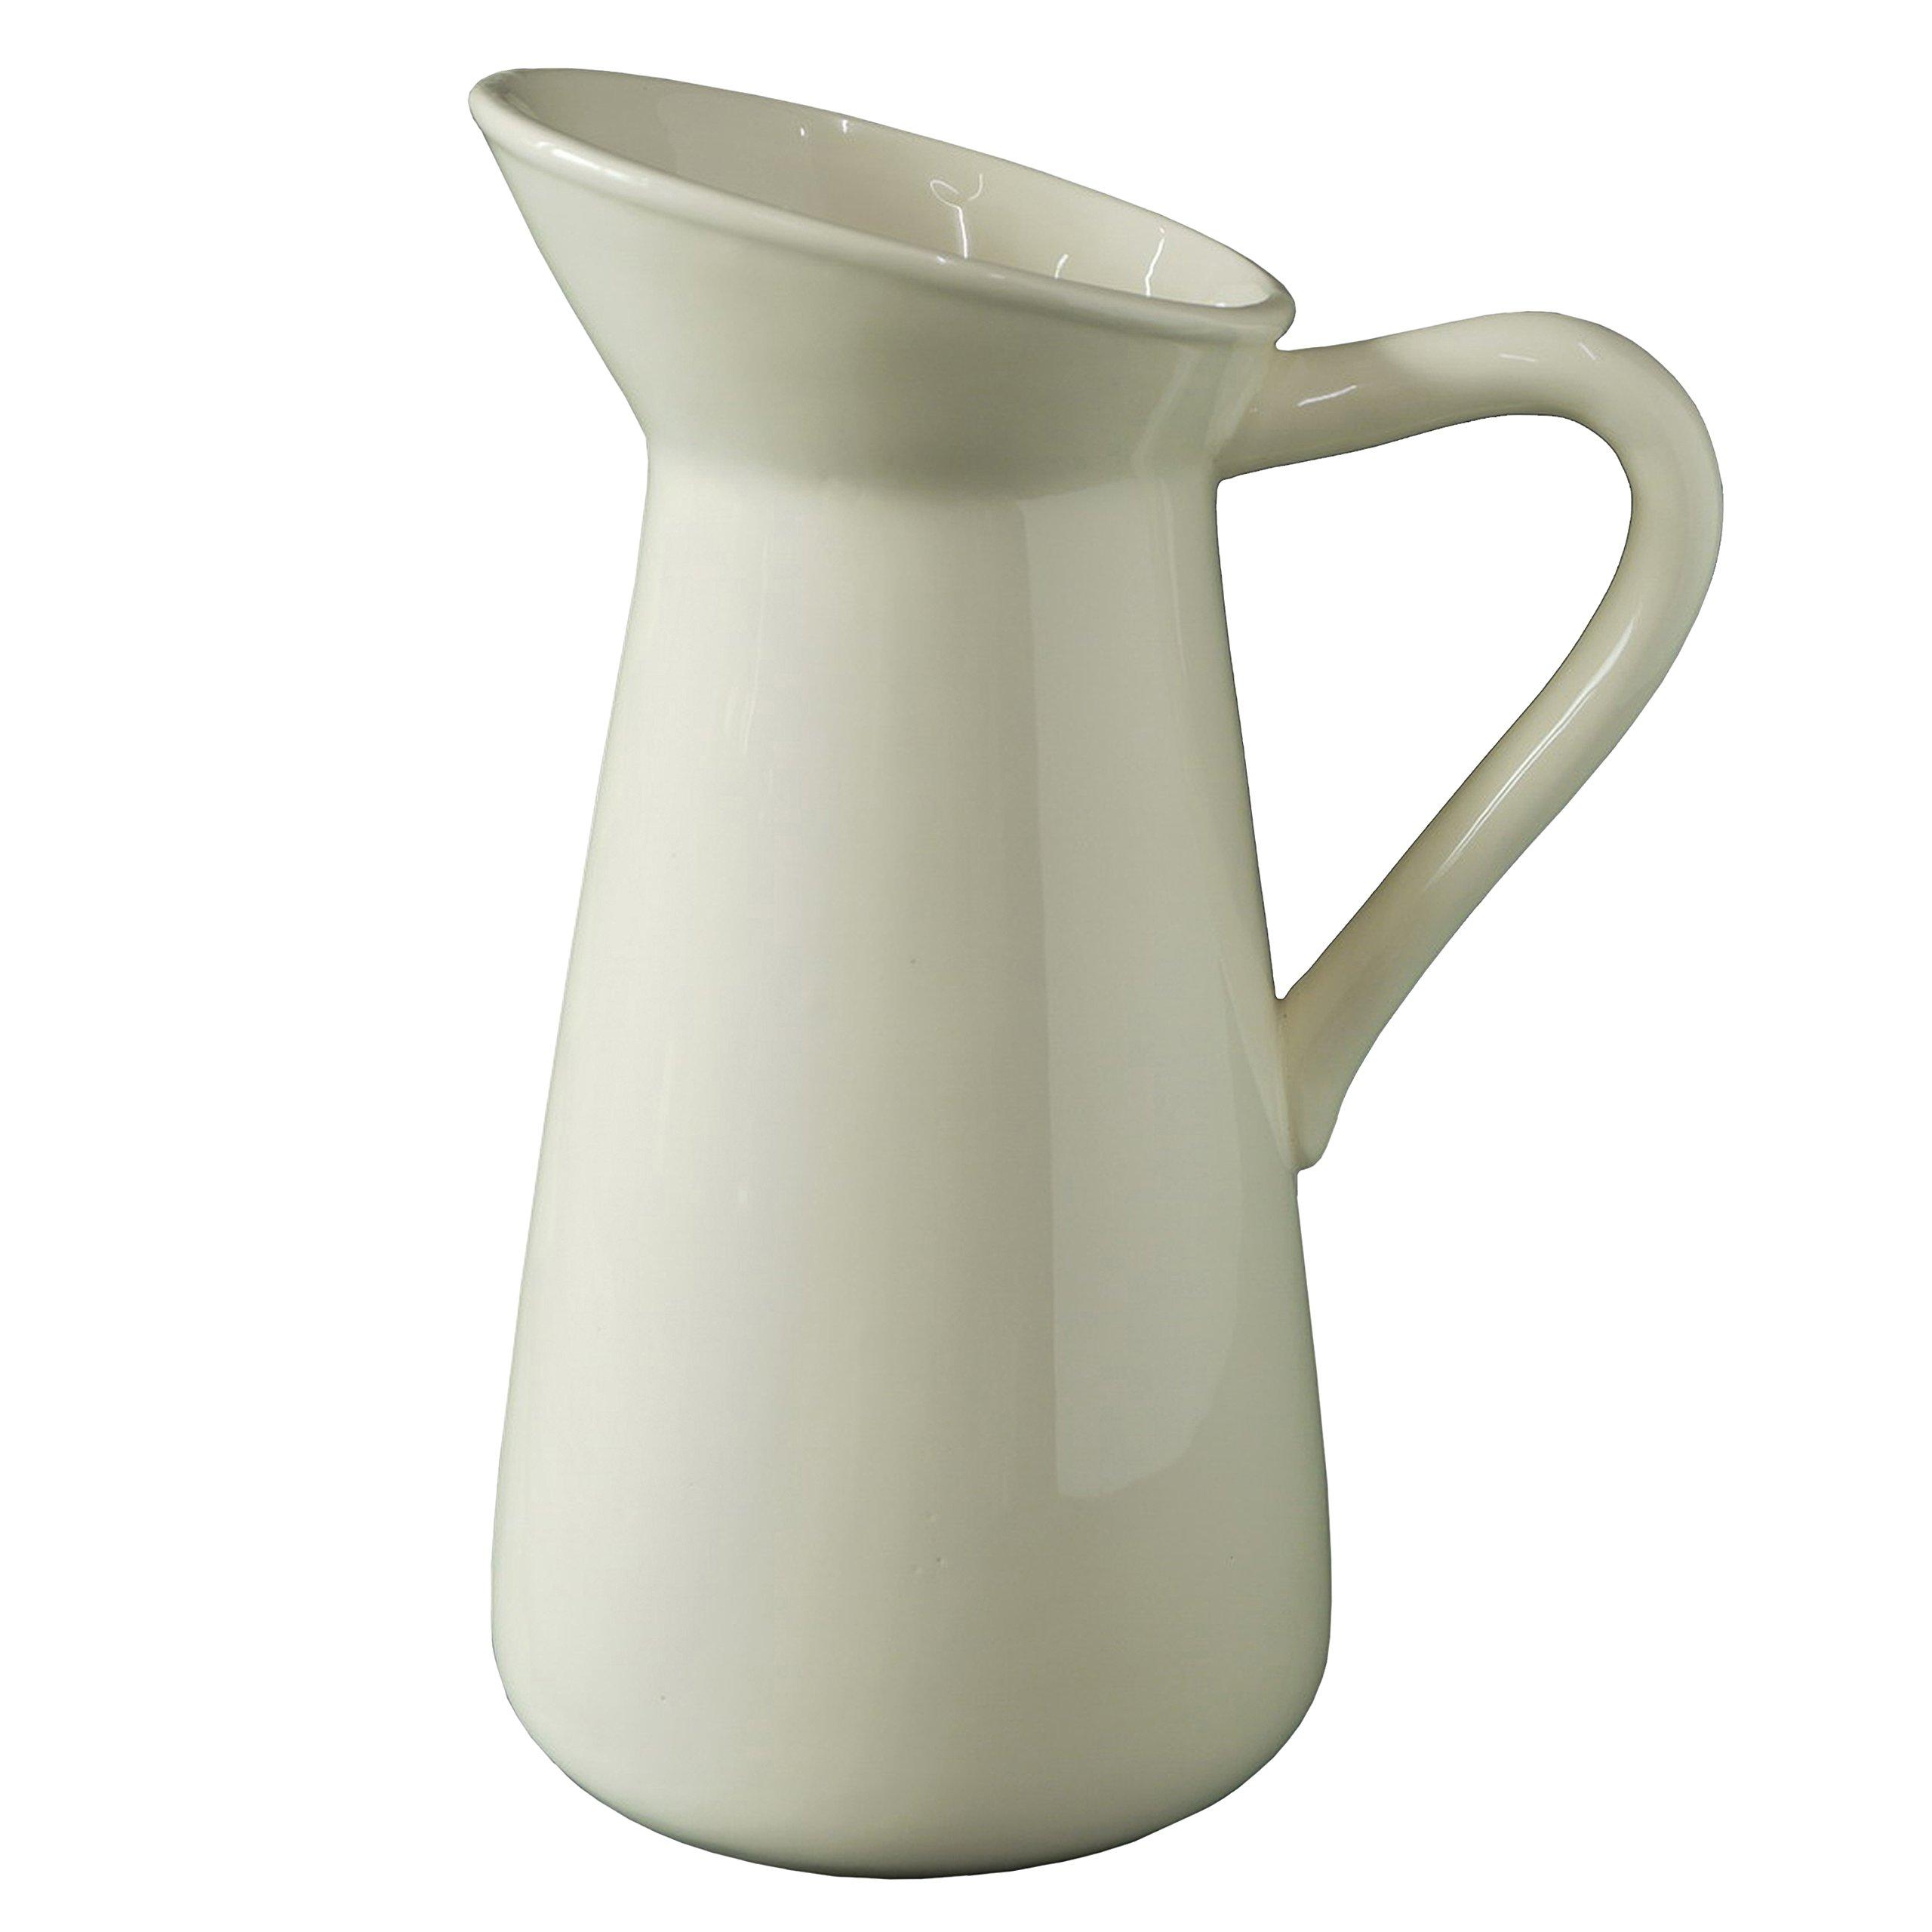 225 & IKEA Vase: Amazon.com